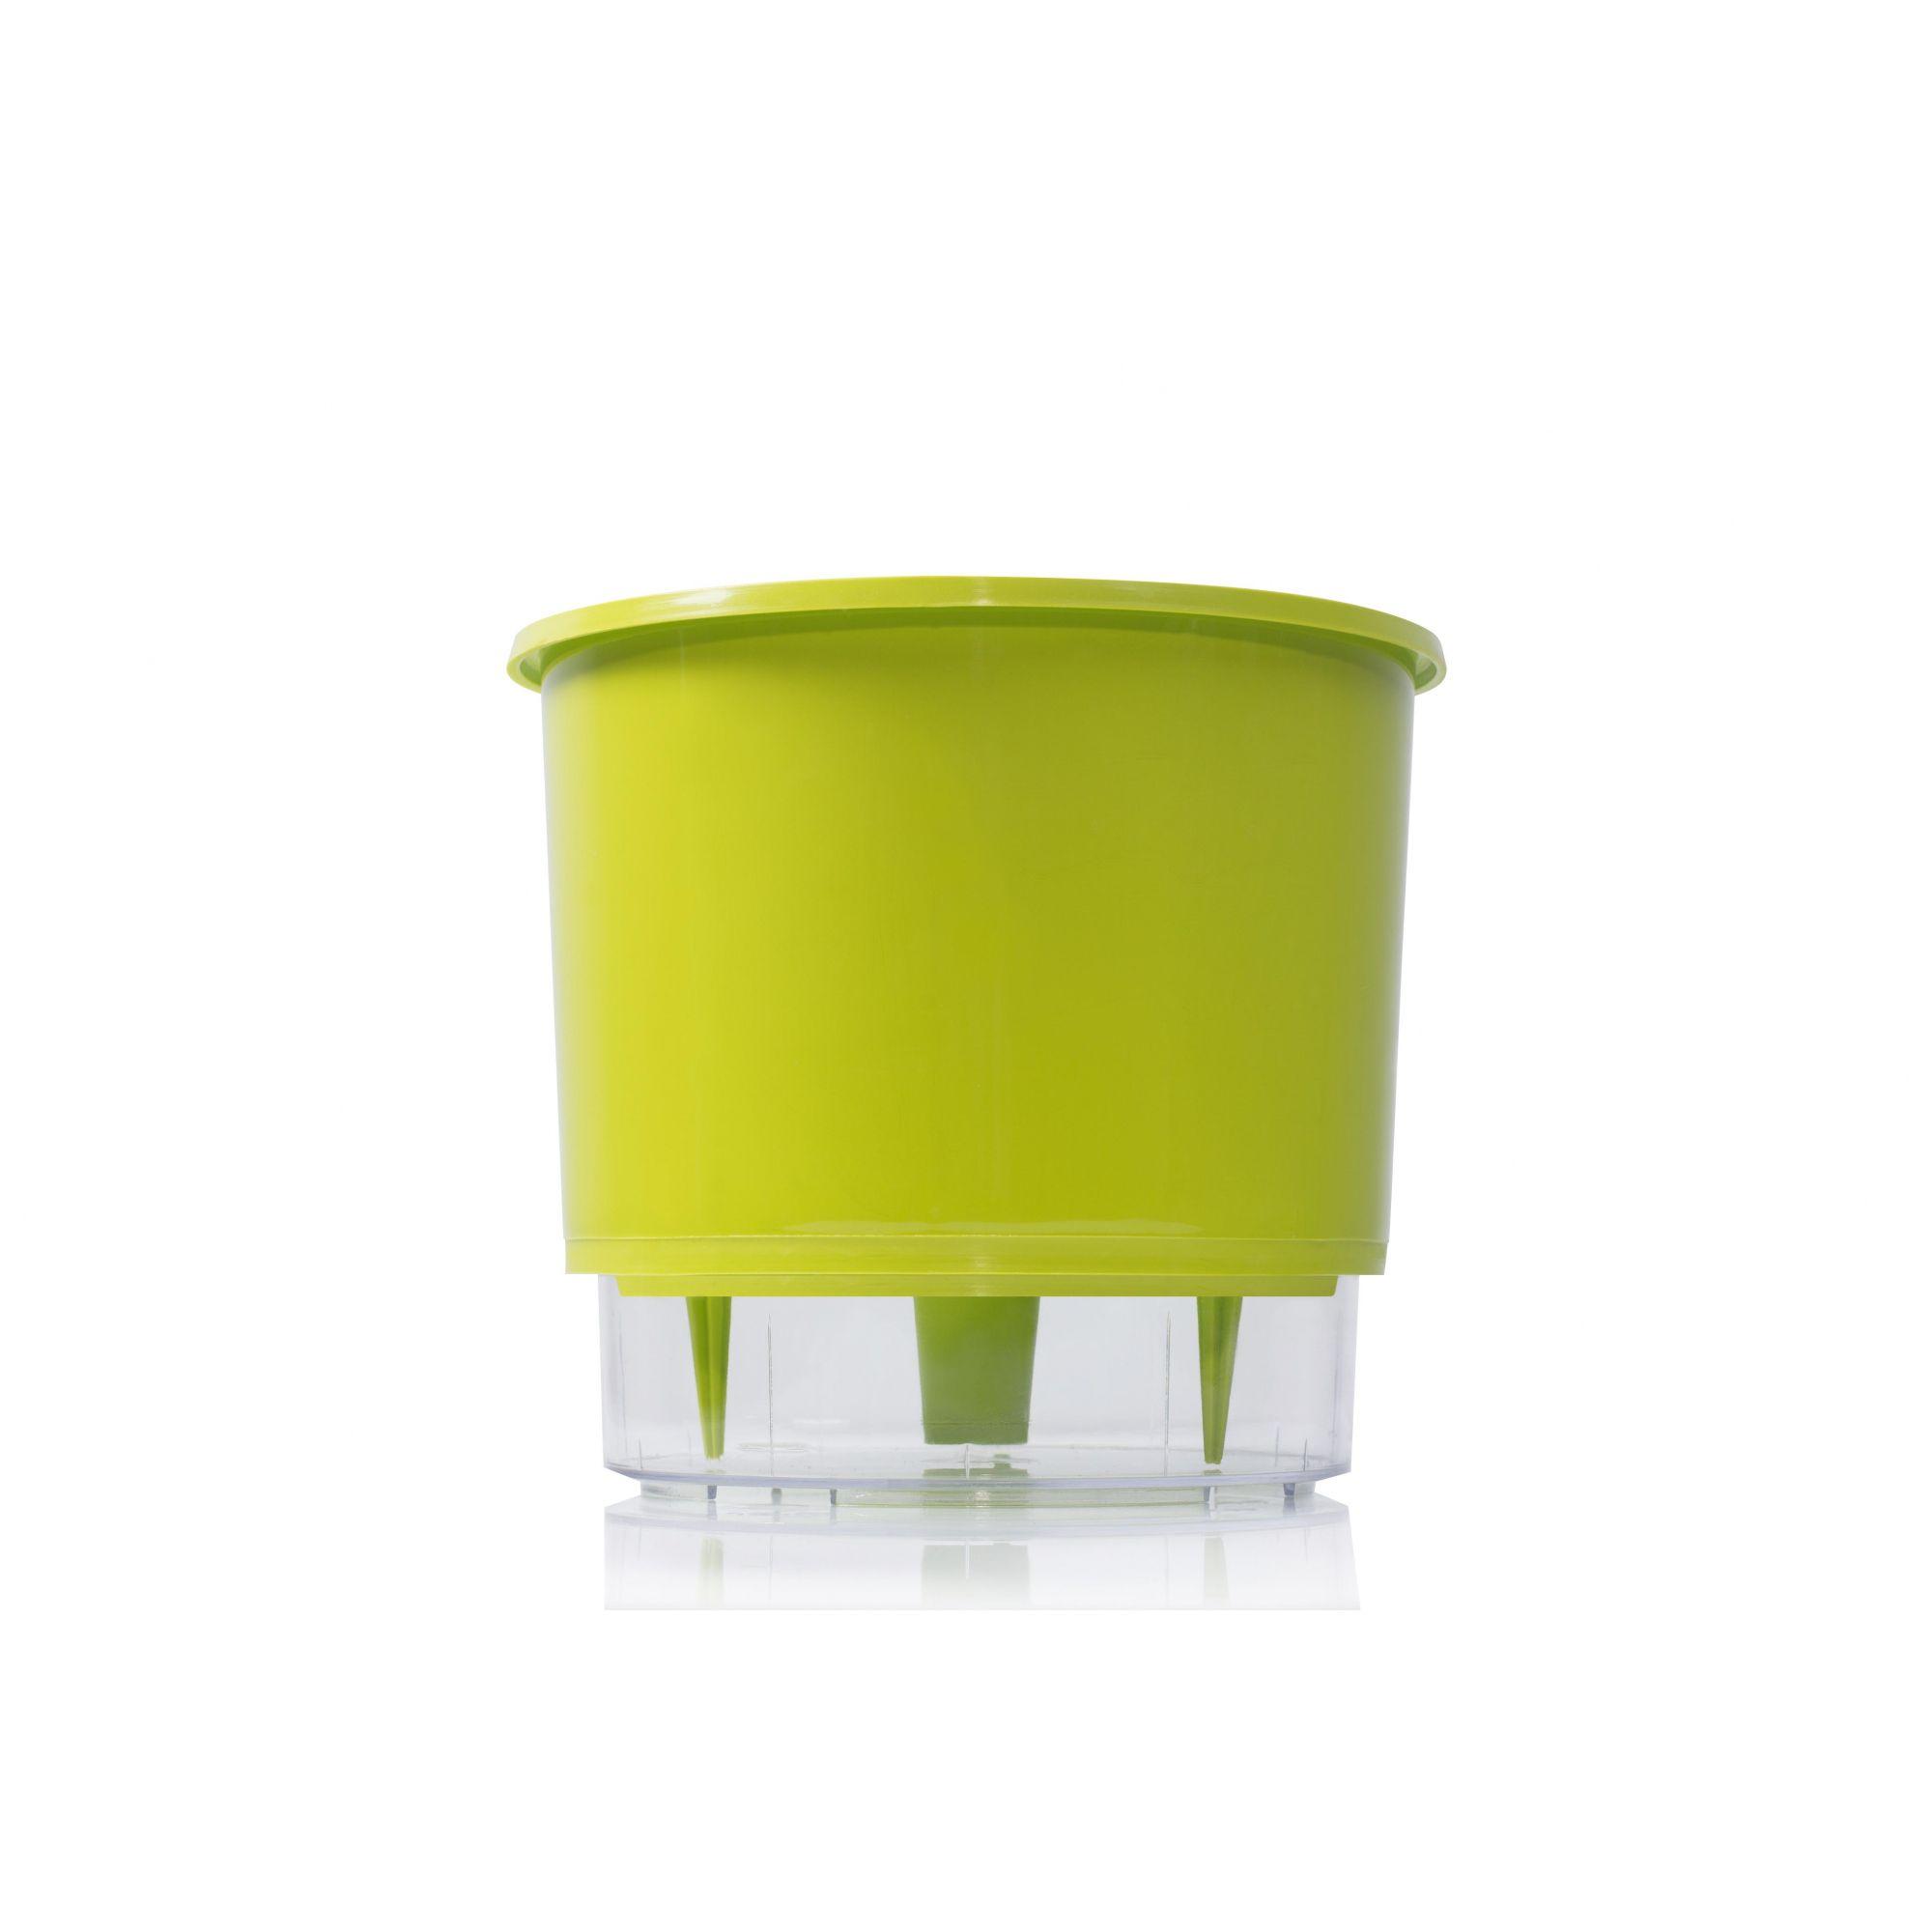 Vaso Autoirrigável 2 Verde Claro Raiz